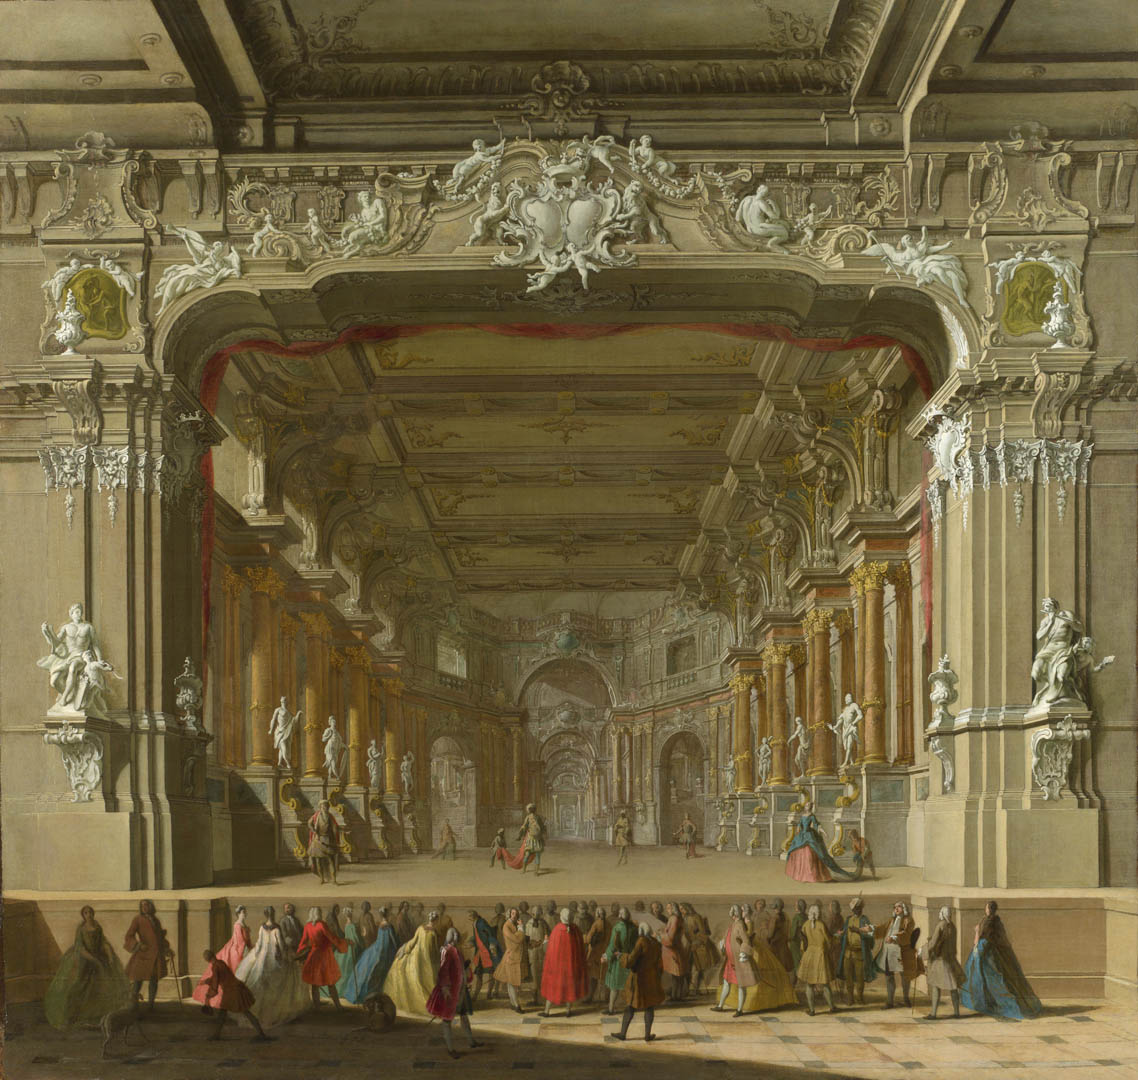 Of A Theatre   A italian renaissance northern art wallpaper picture 1138x1080